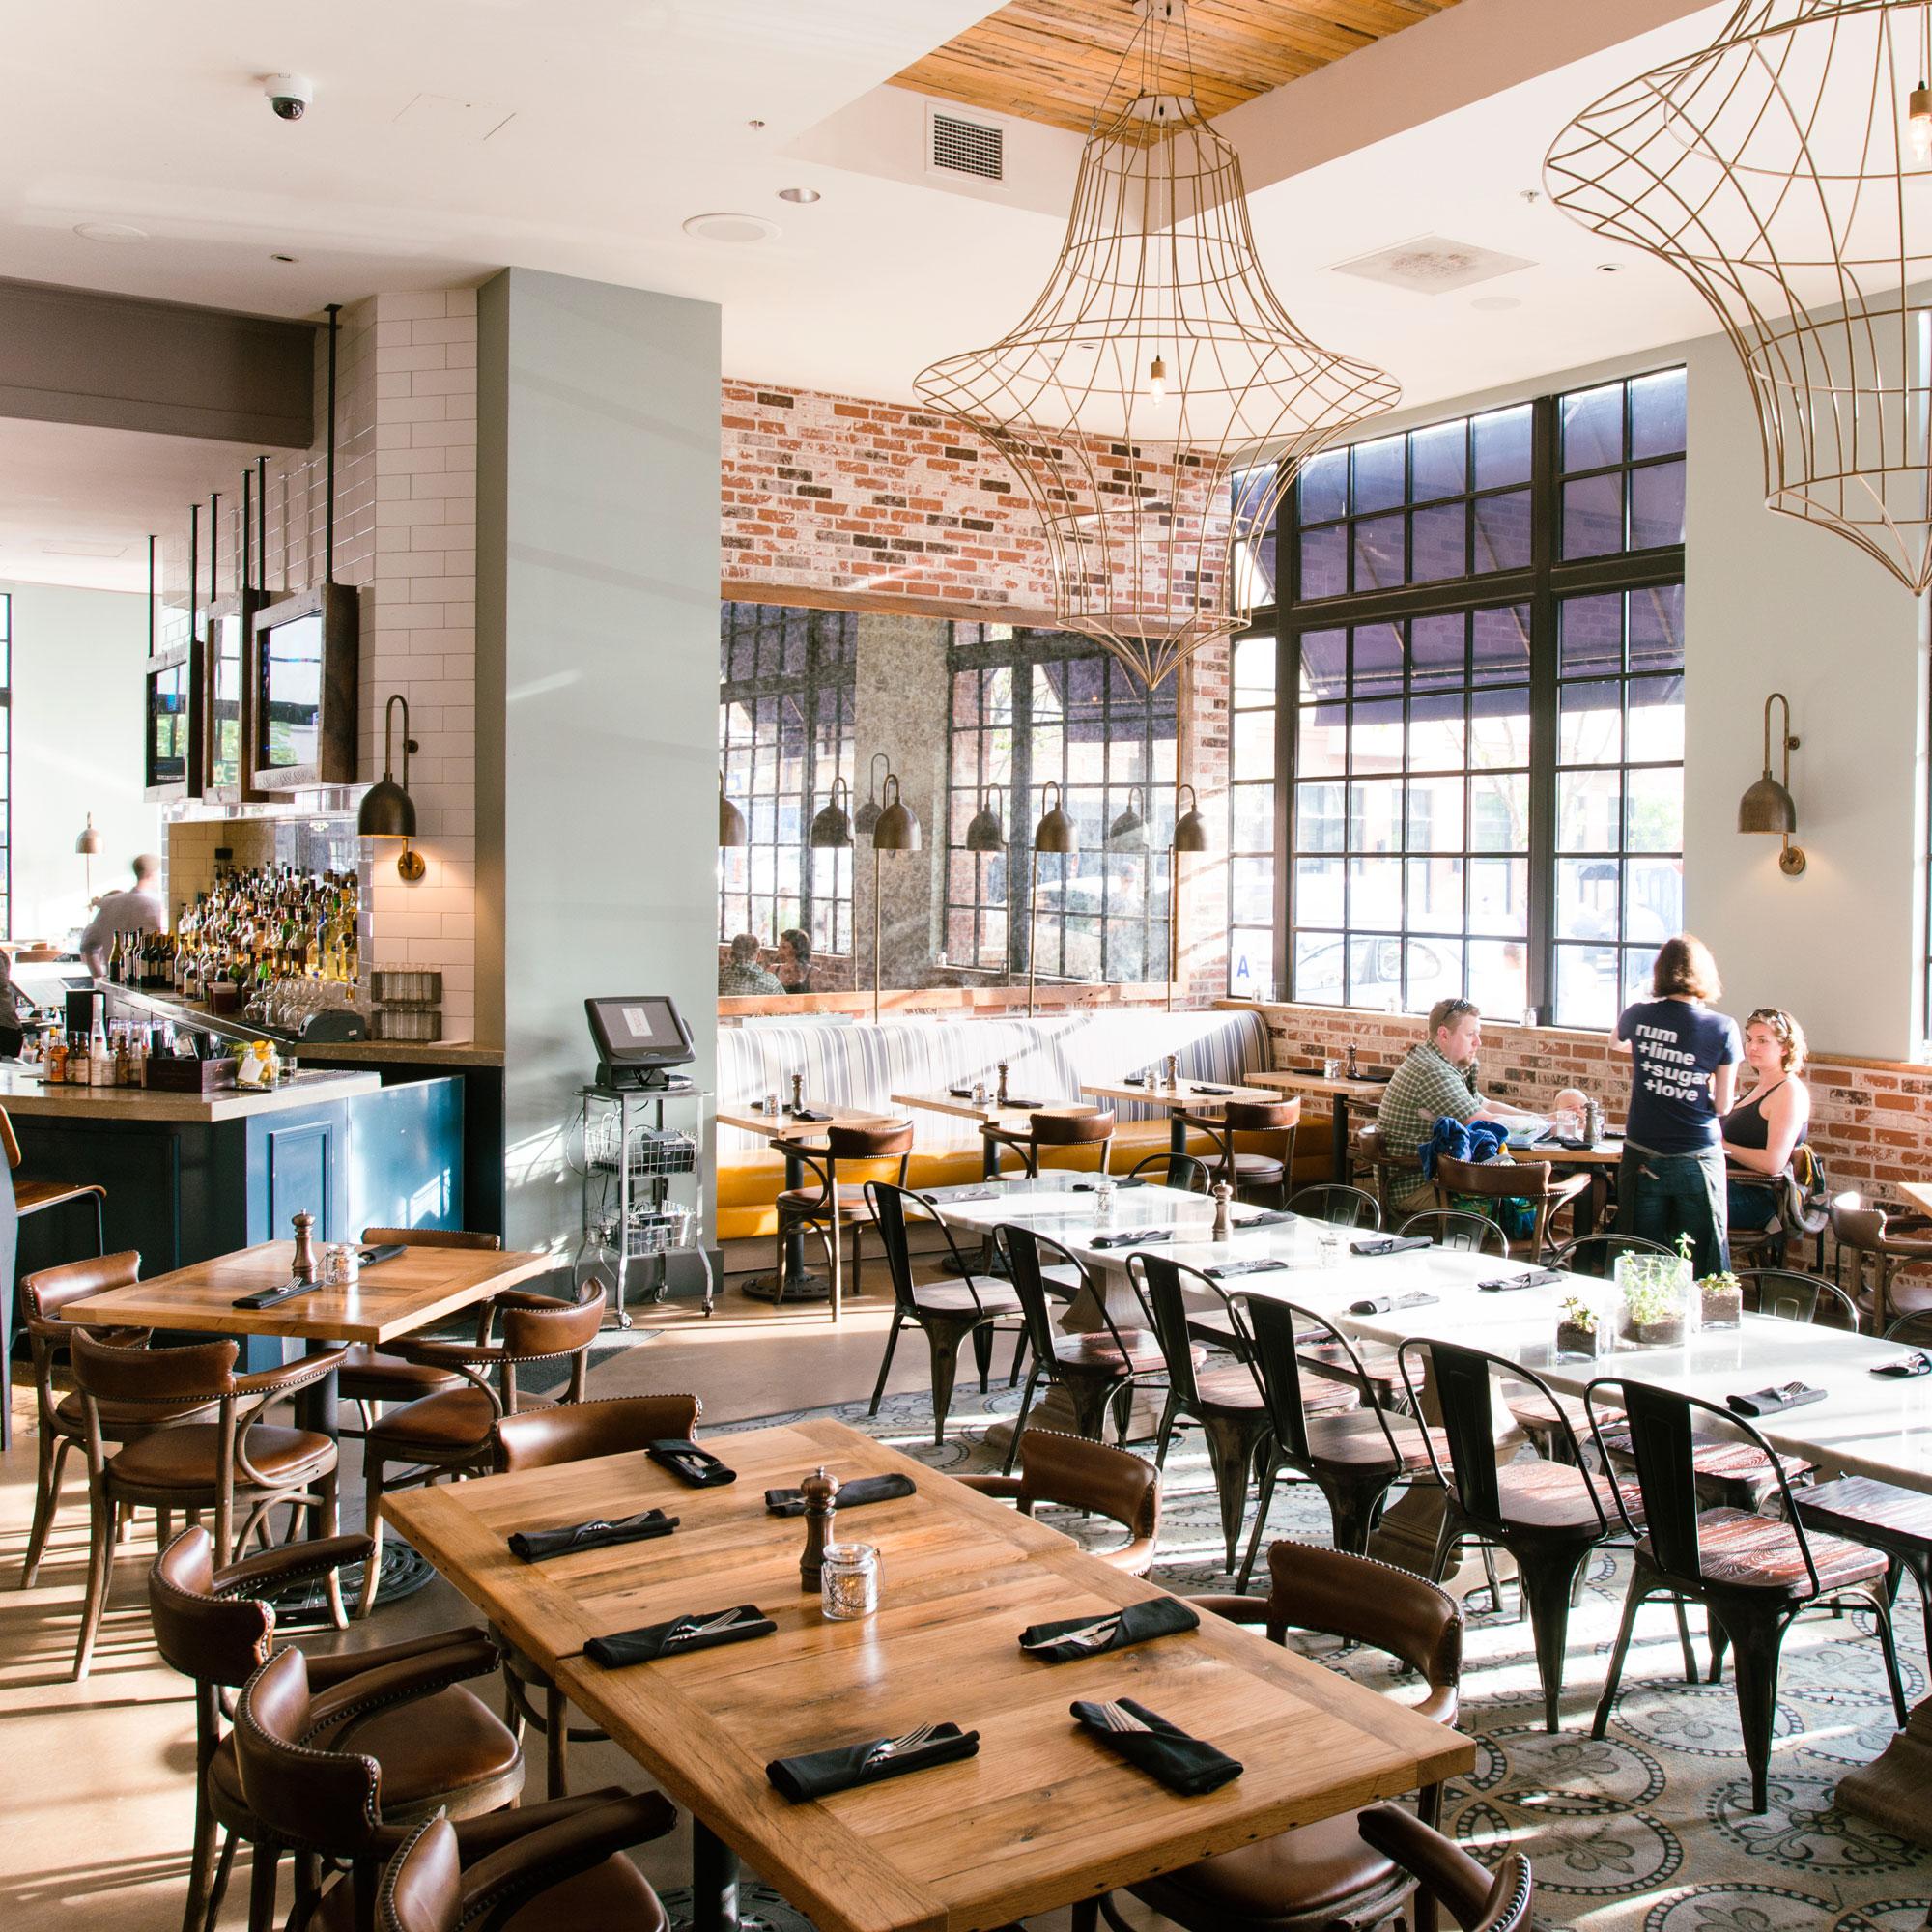 San Diego Interior Designers: Amazing Restaurant Designs